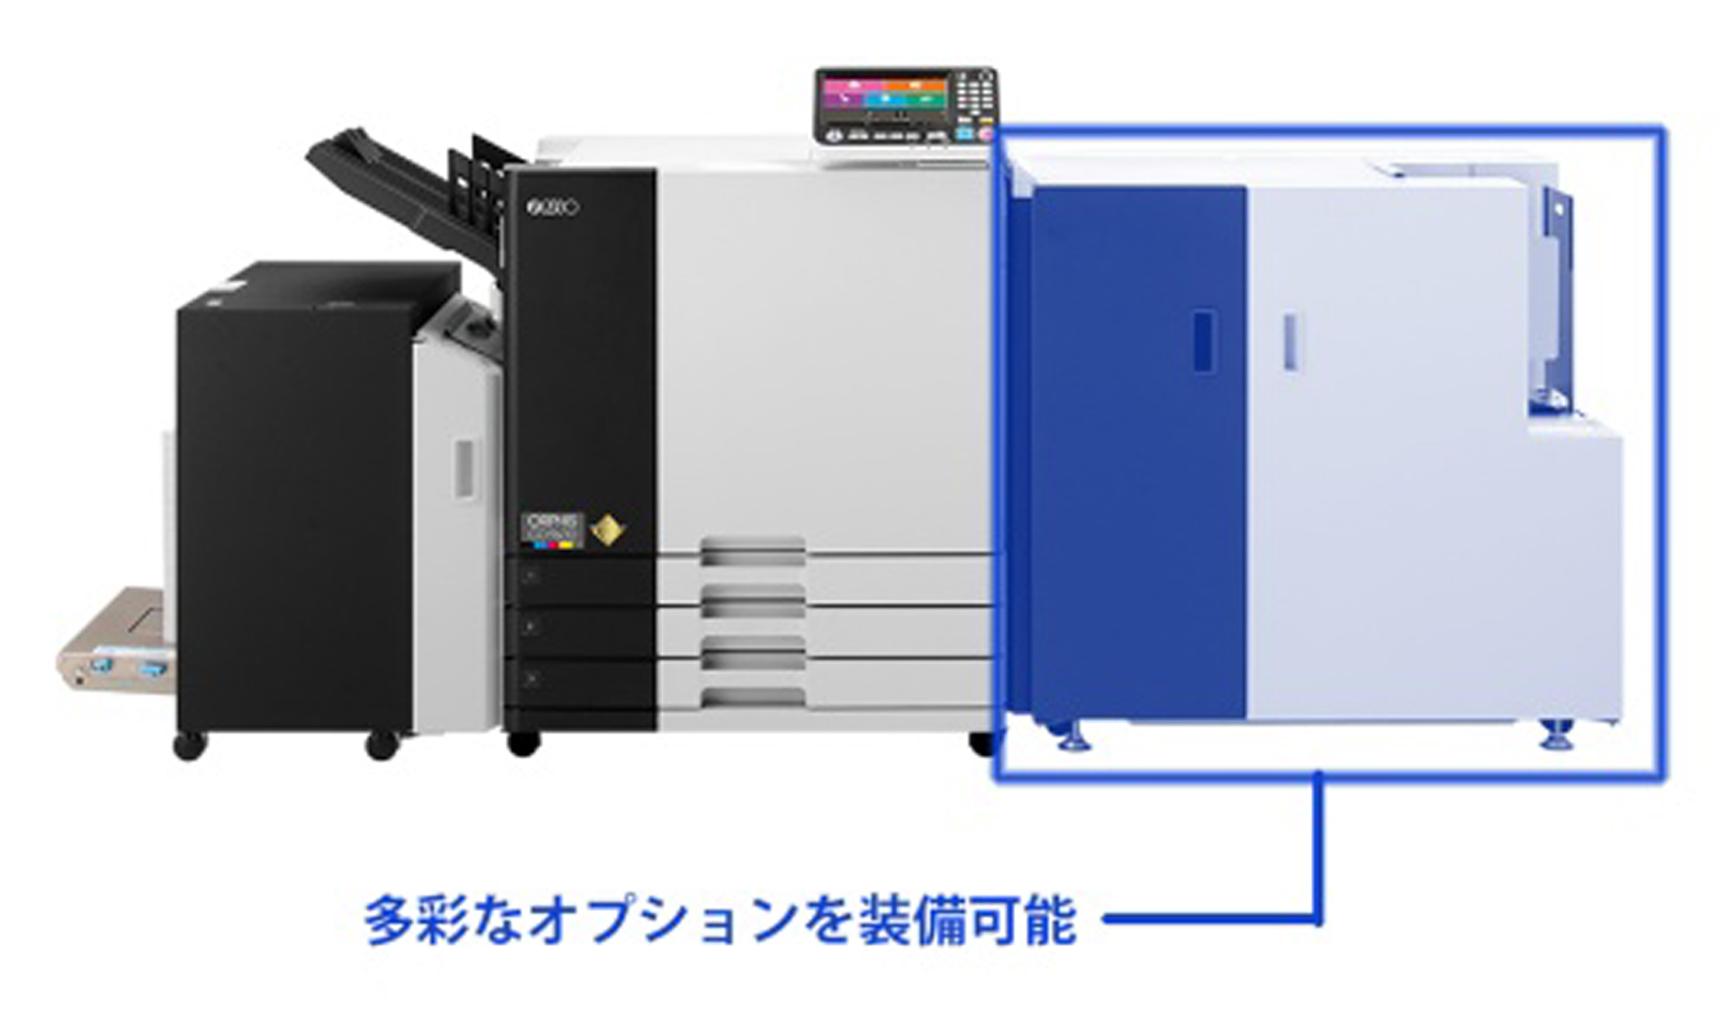 「ORPHIS GD9630 PREMIUM」は、多彩なオプションが特長